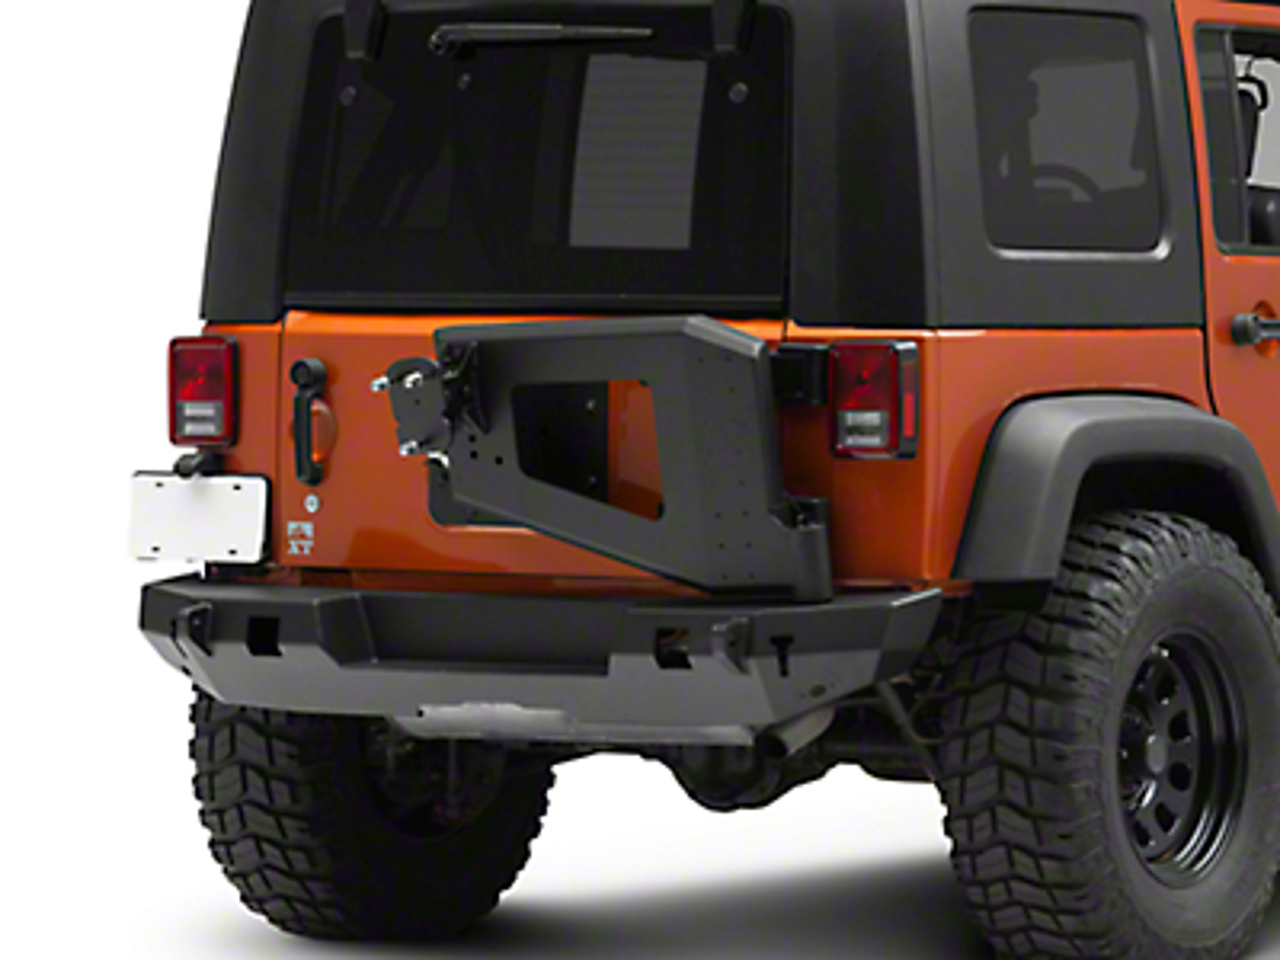 Westin WJ2 Rear Bumper w/ Tire Carrier - Textured Black (07-18 Jeep Wrangler JK)